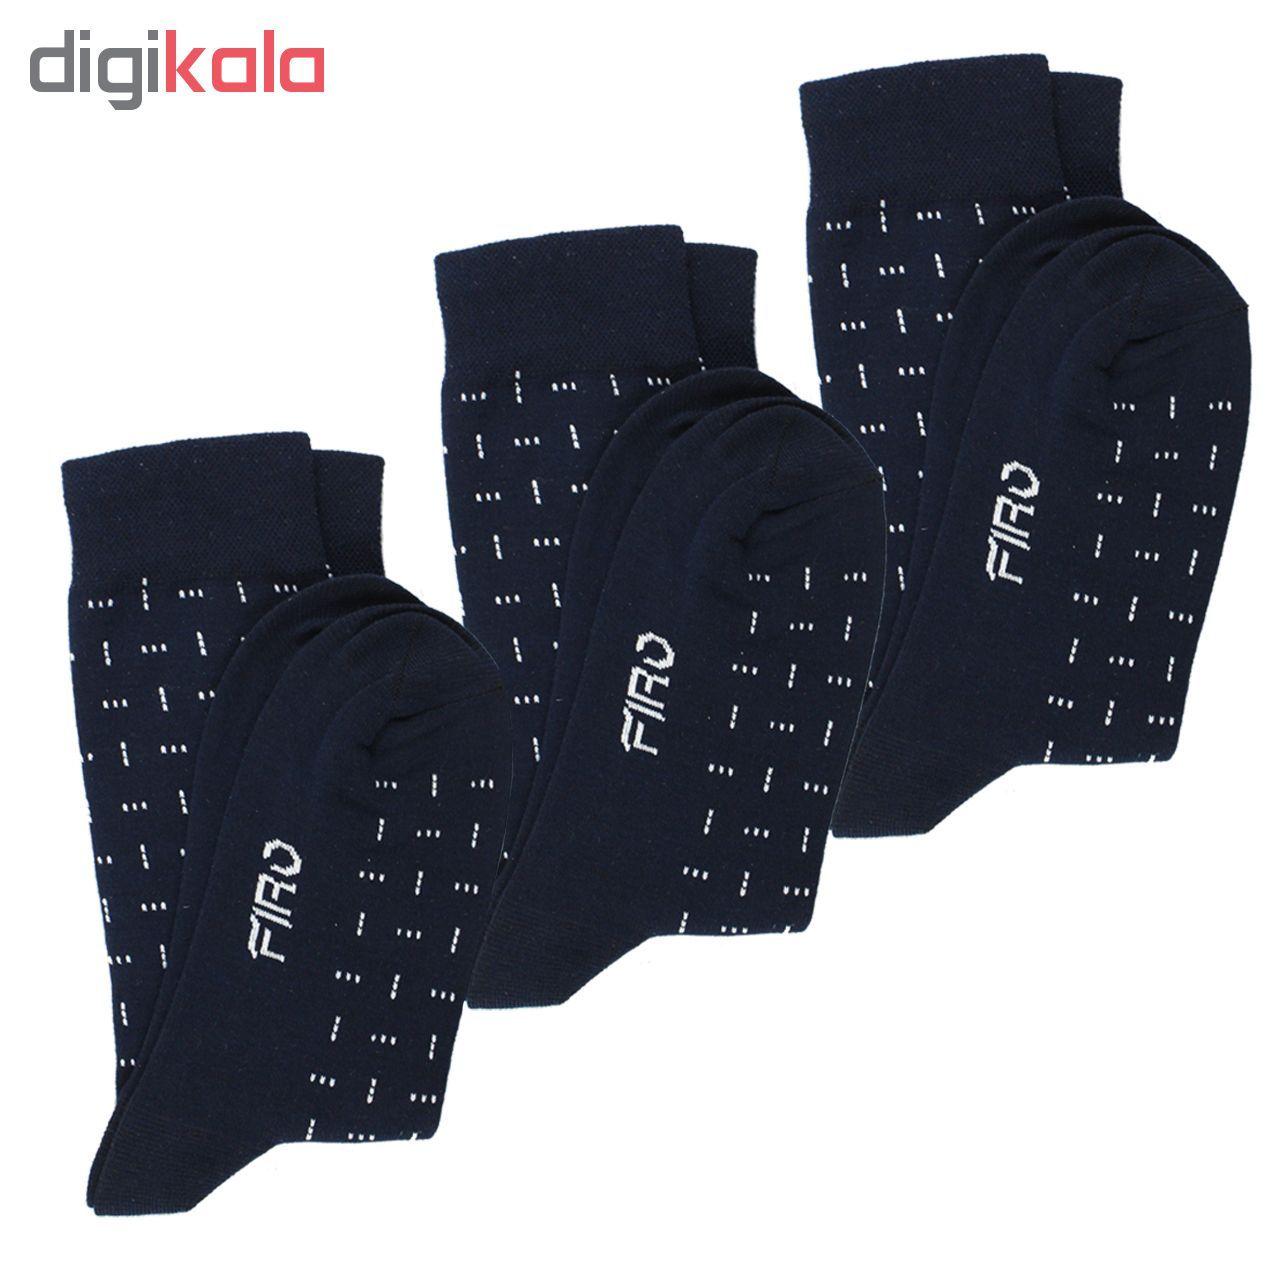 جوراب مردانه فیرو مدل FT243 بسته 3 عددی main 1 1